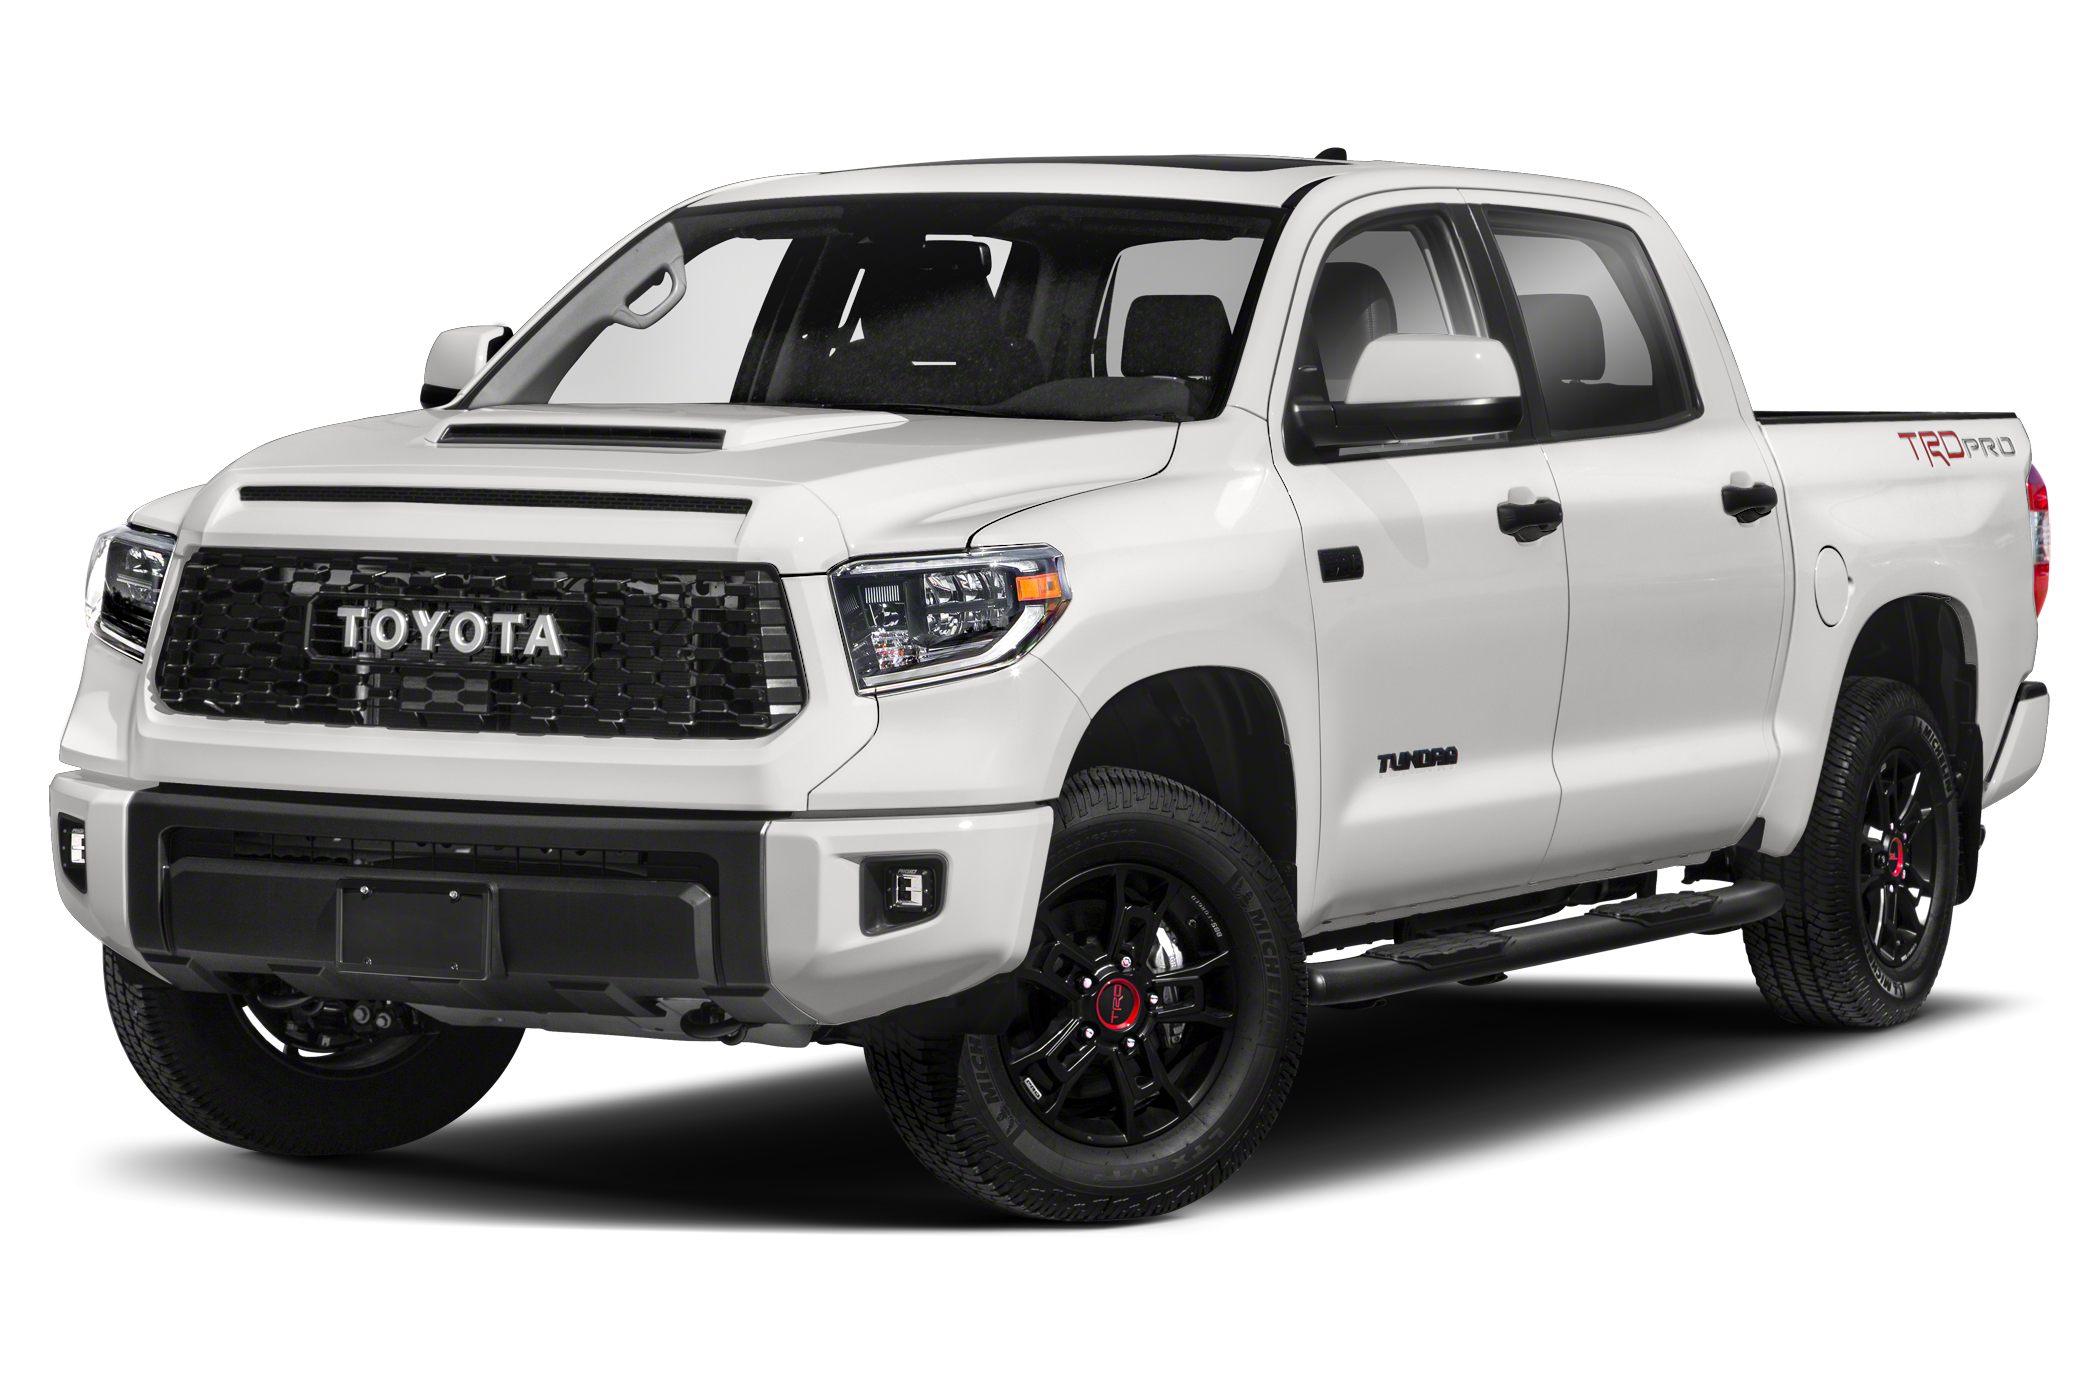 2019 Toyota Tundra TRD Pro 5.7L V8 4x4 CrewMax 5.6 ft. box 145.7 in. WB